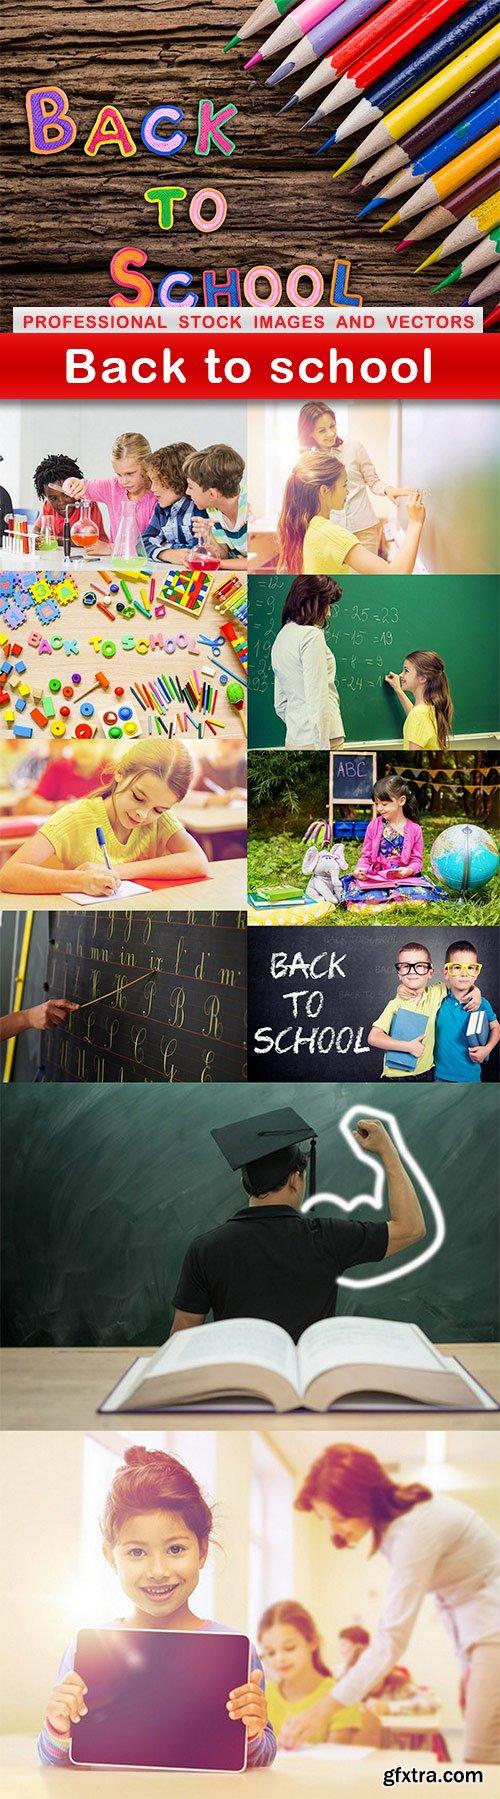 Back to school - 11 UHQ JPEG